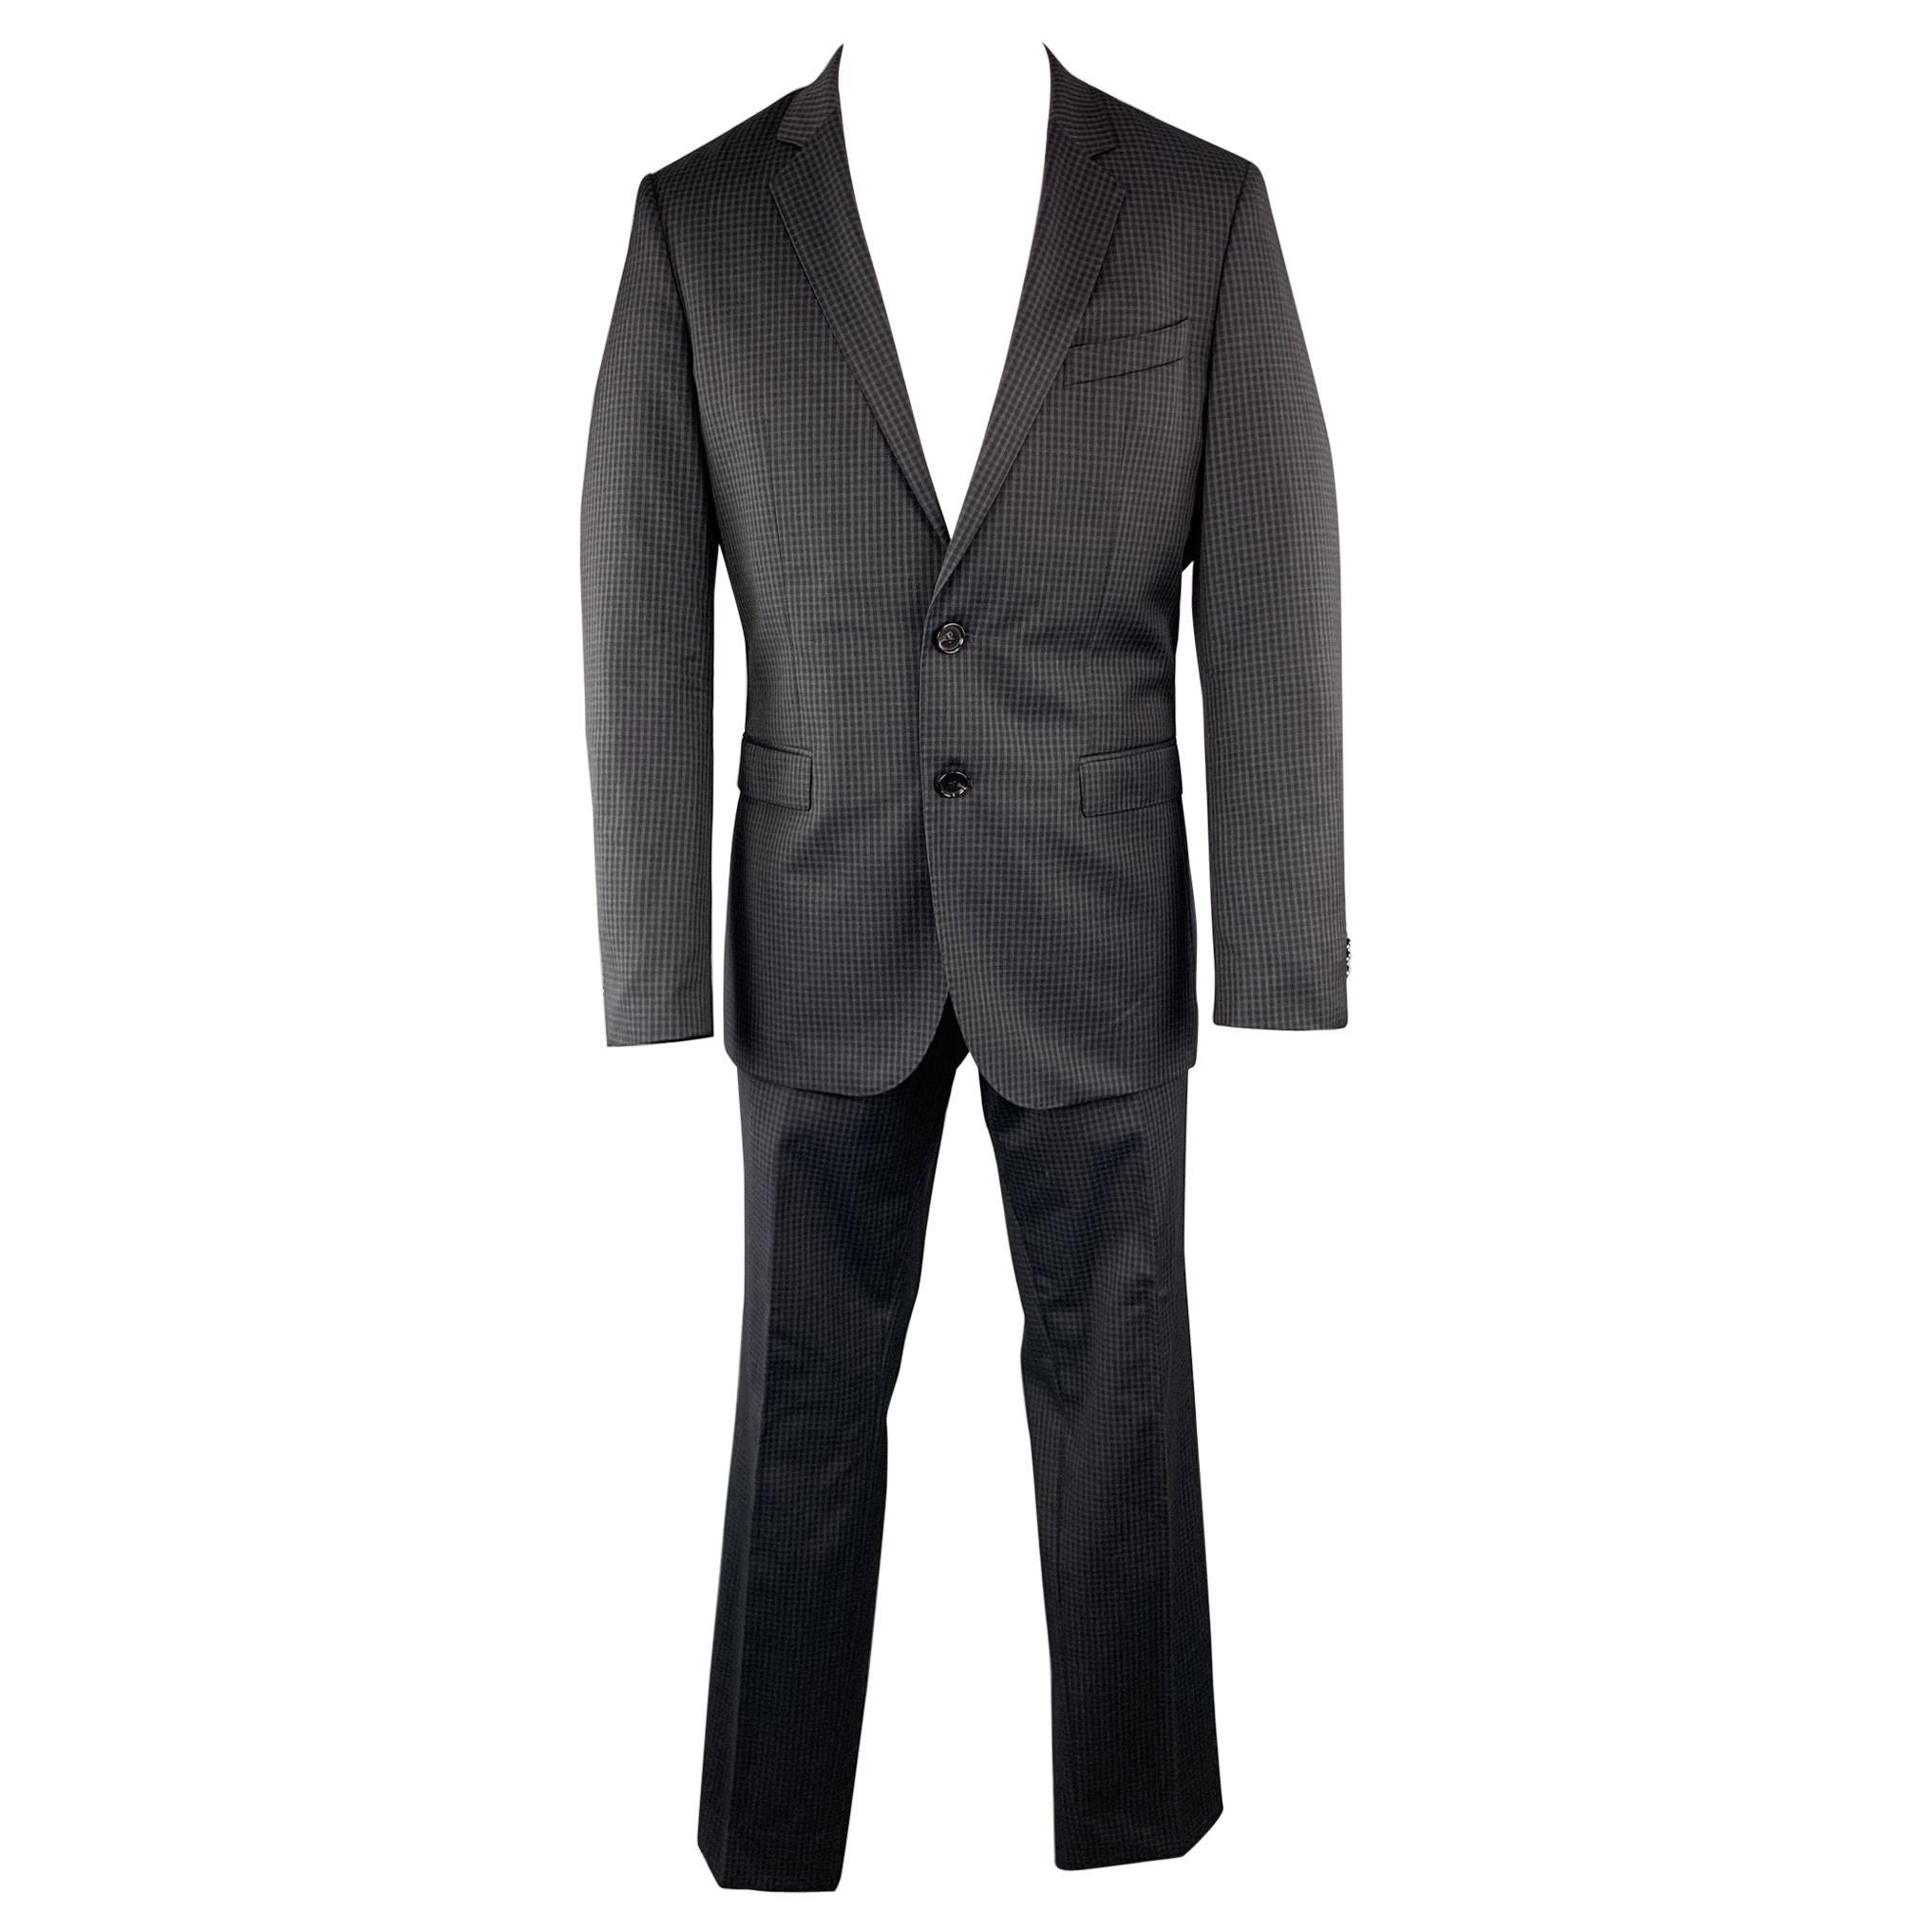 HUGO BOSS Size 40 Plaid Navy Wool 34 x 31 Notch Lapel Suit